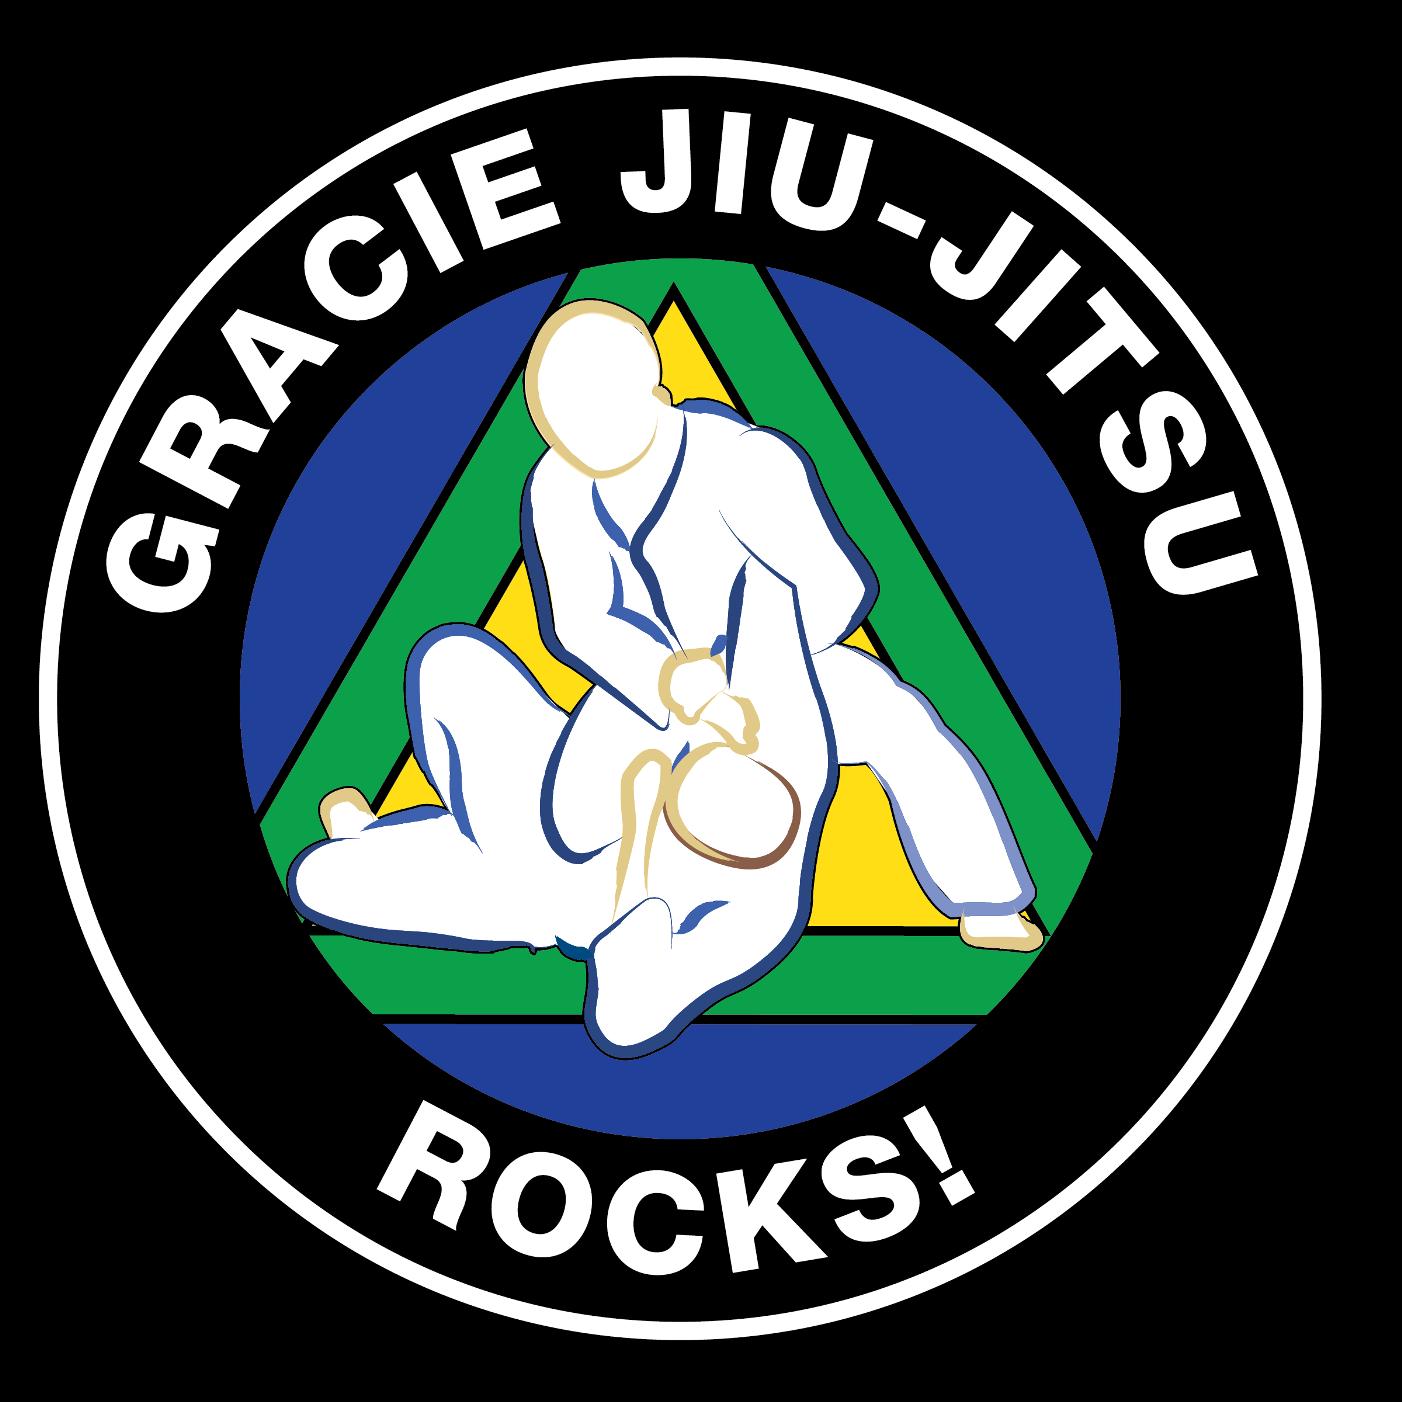 Gracie Jiu Jitsu Rocks! podcast show art